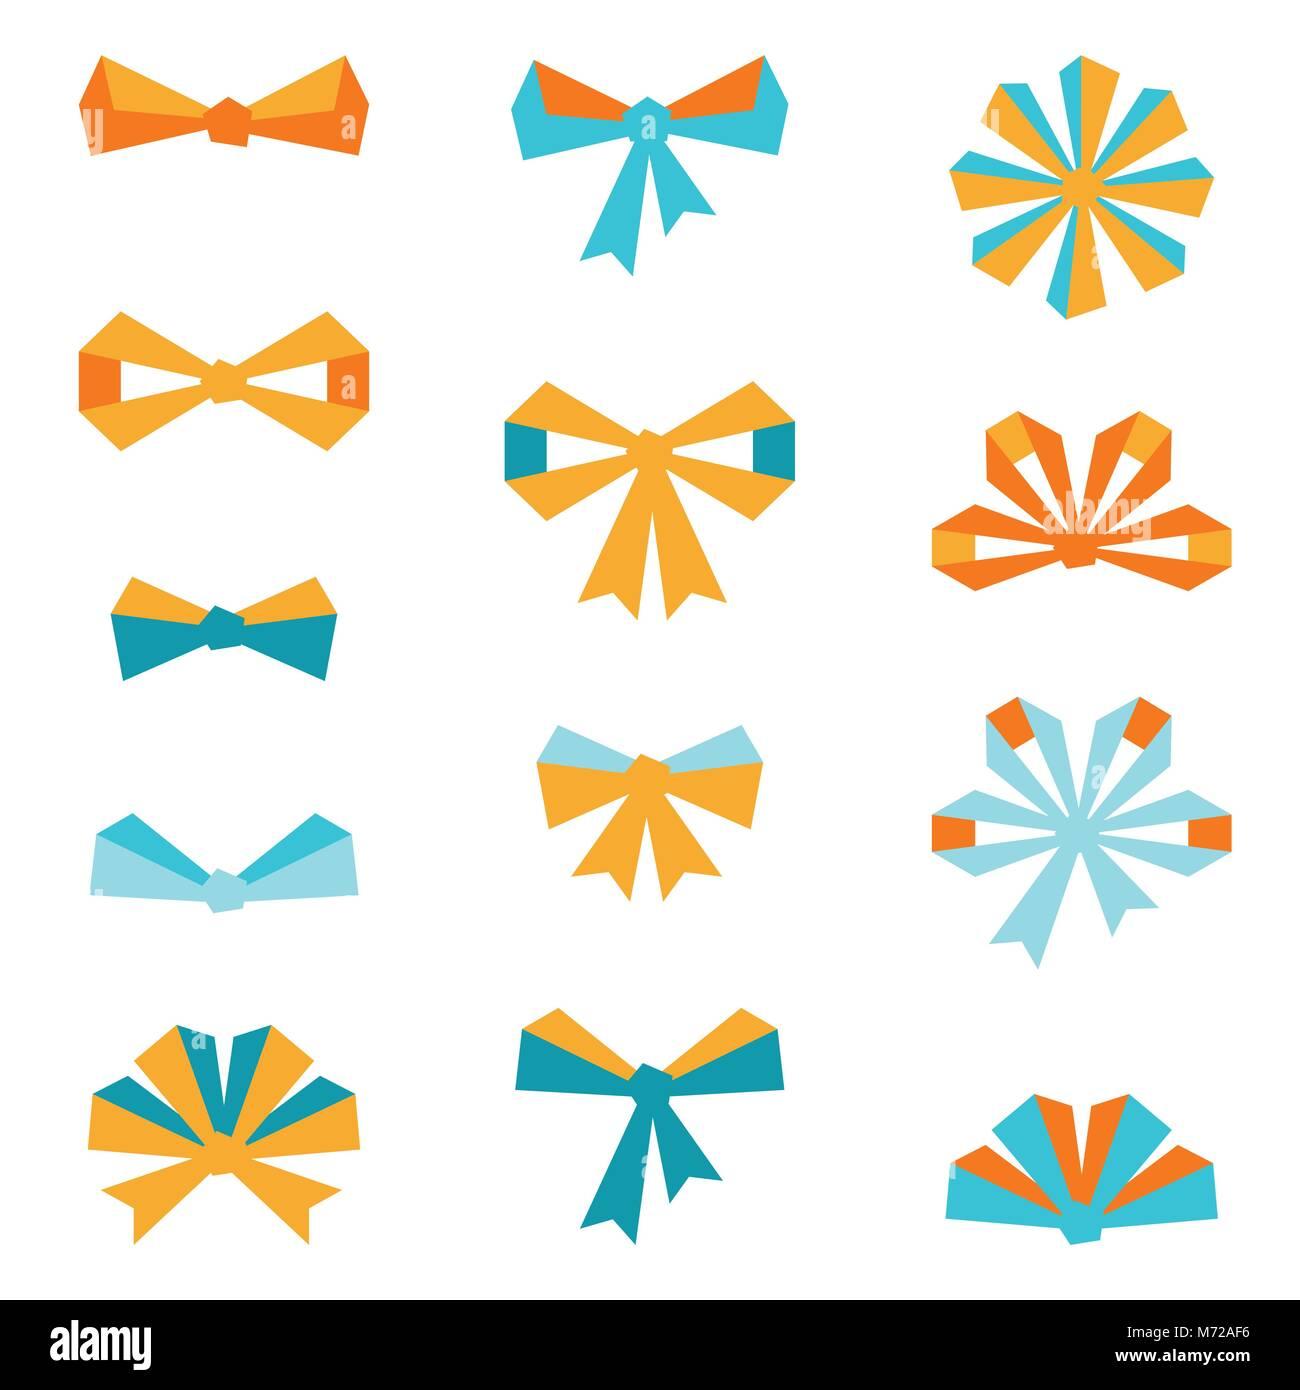 Set of various abstract bows and ribbons - Stock Vector